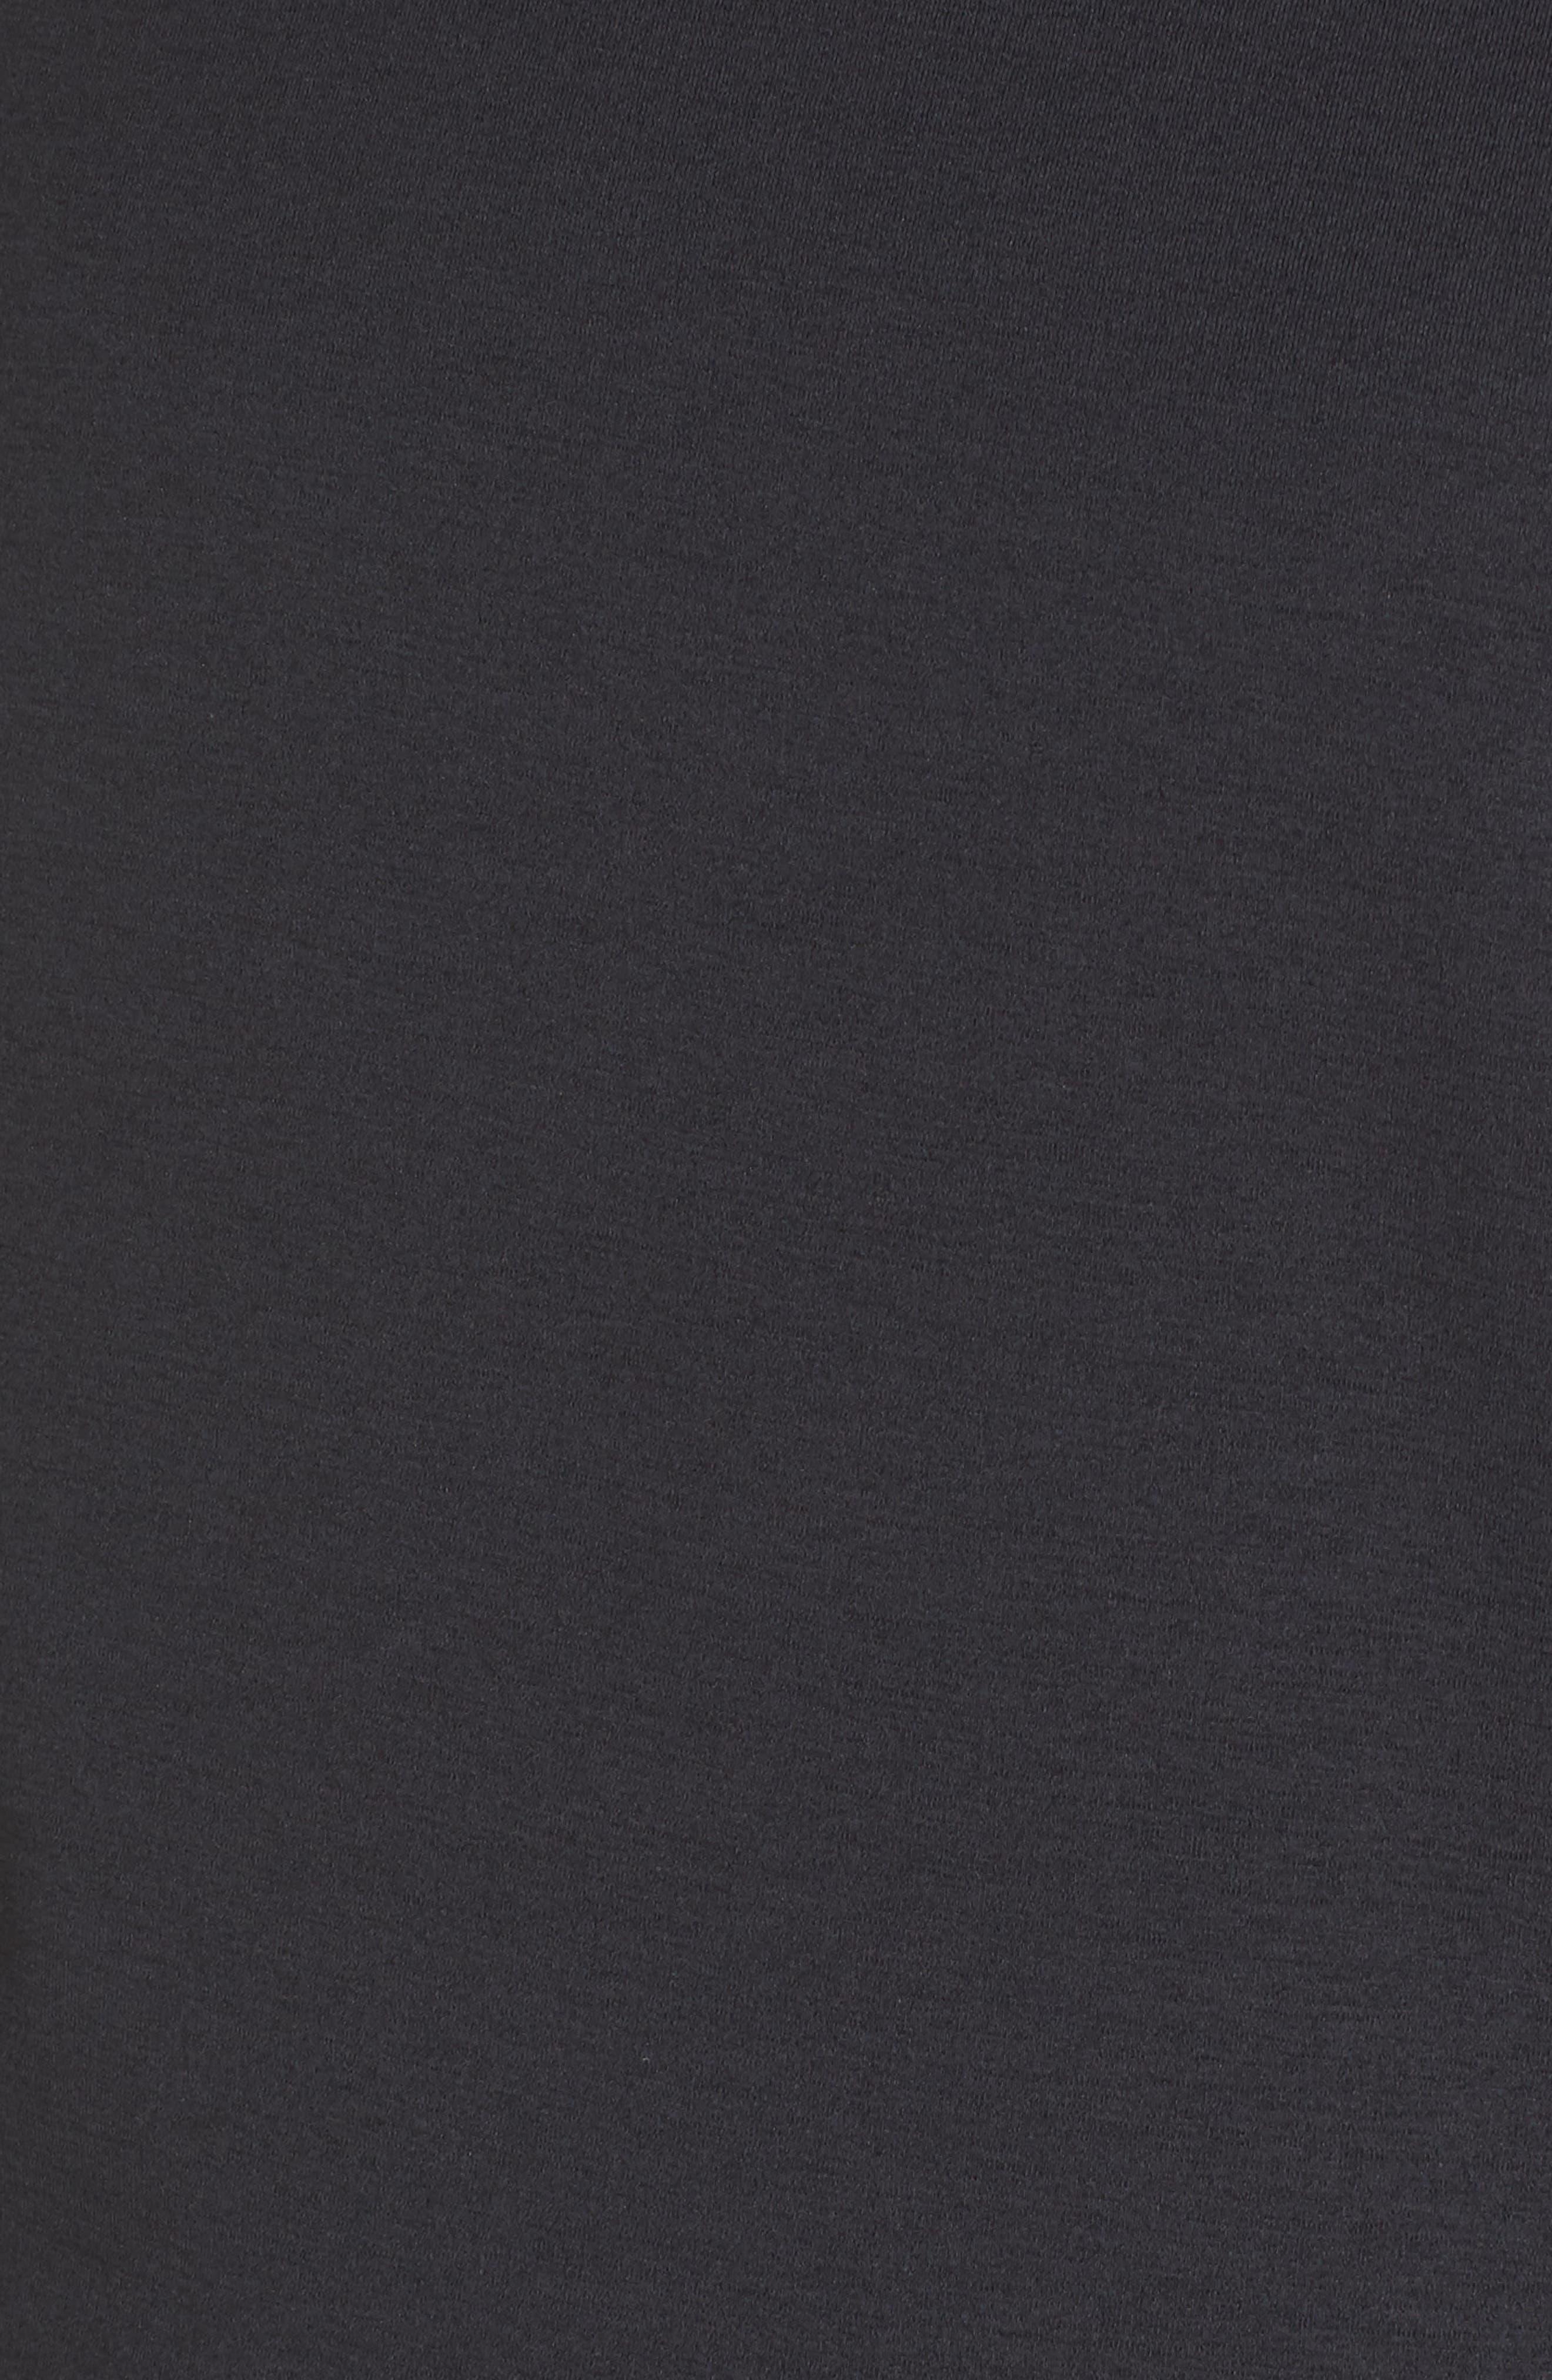 Supernova Run Sweatshirt,                             Alternate thumbnail 6, color,                             BLACK/ COLORED HEATHER